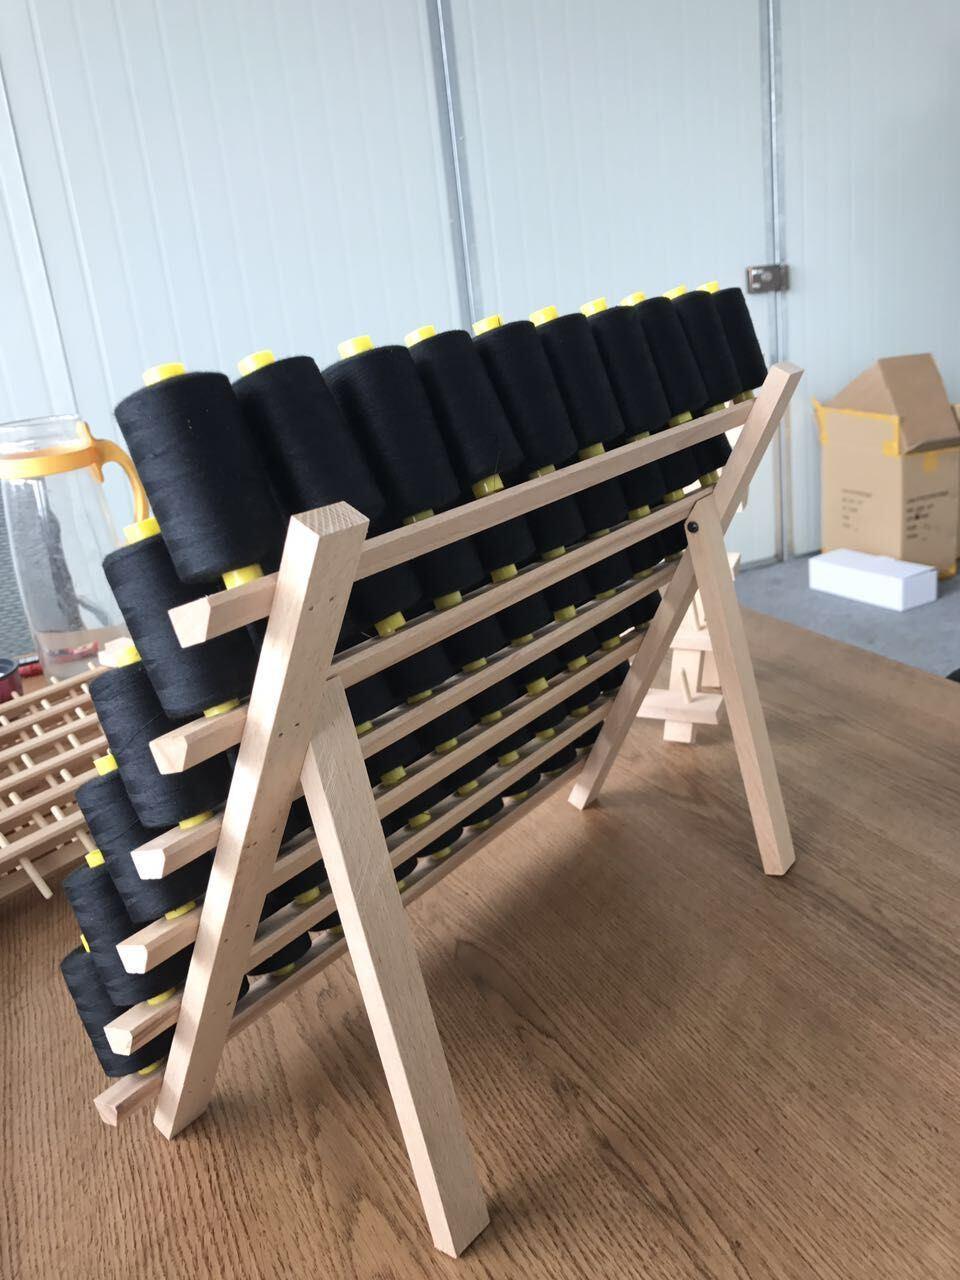 Wooden Thread Rack, Thread display Unit, Thread Stand